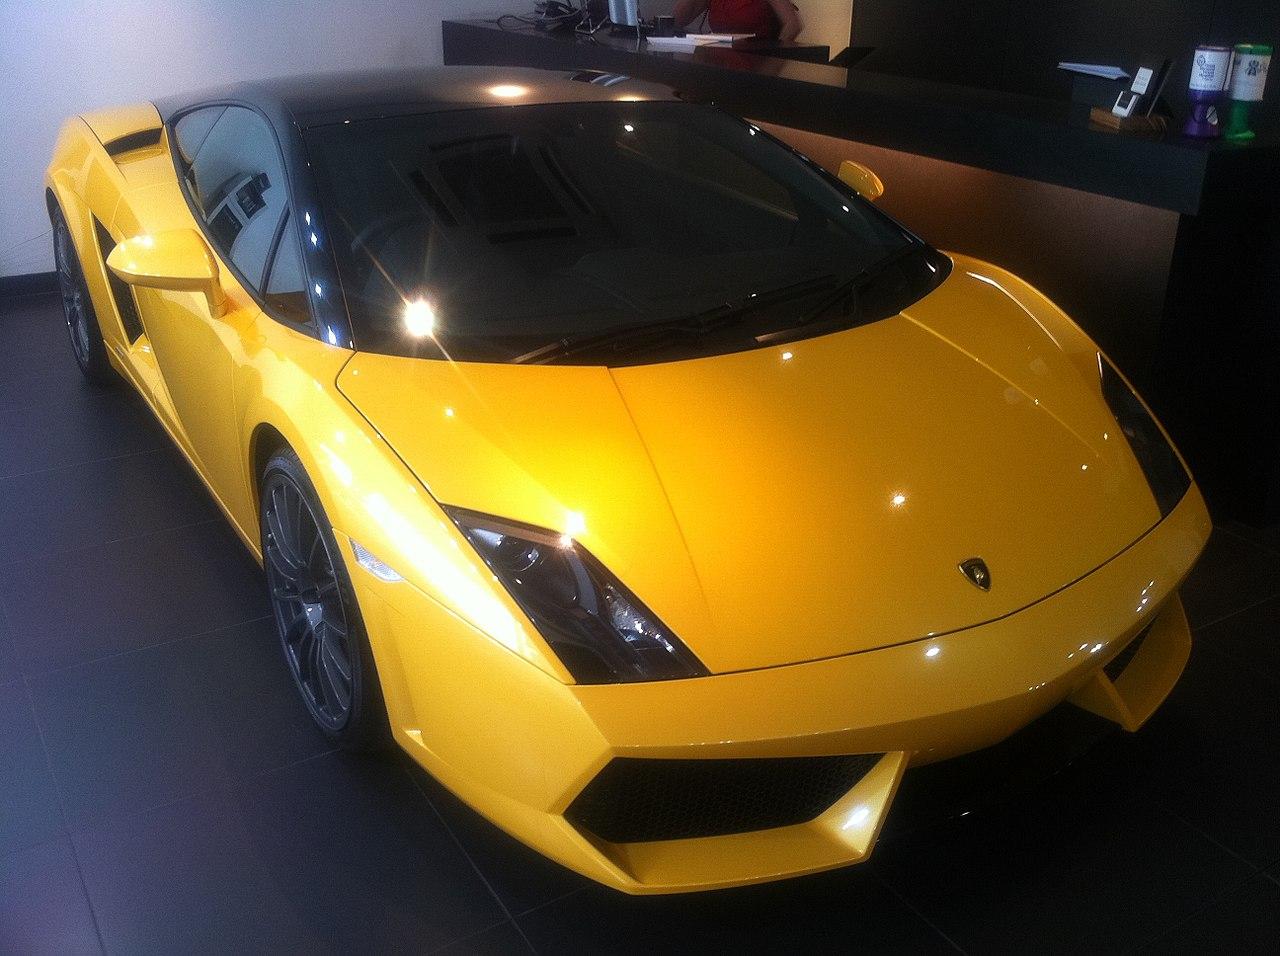 File Lamborghini Lp560 4 Gallardo Yellow Black 6390305145 Jpg